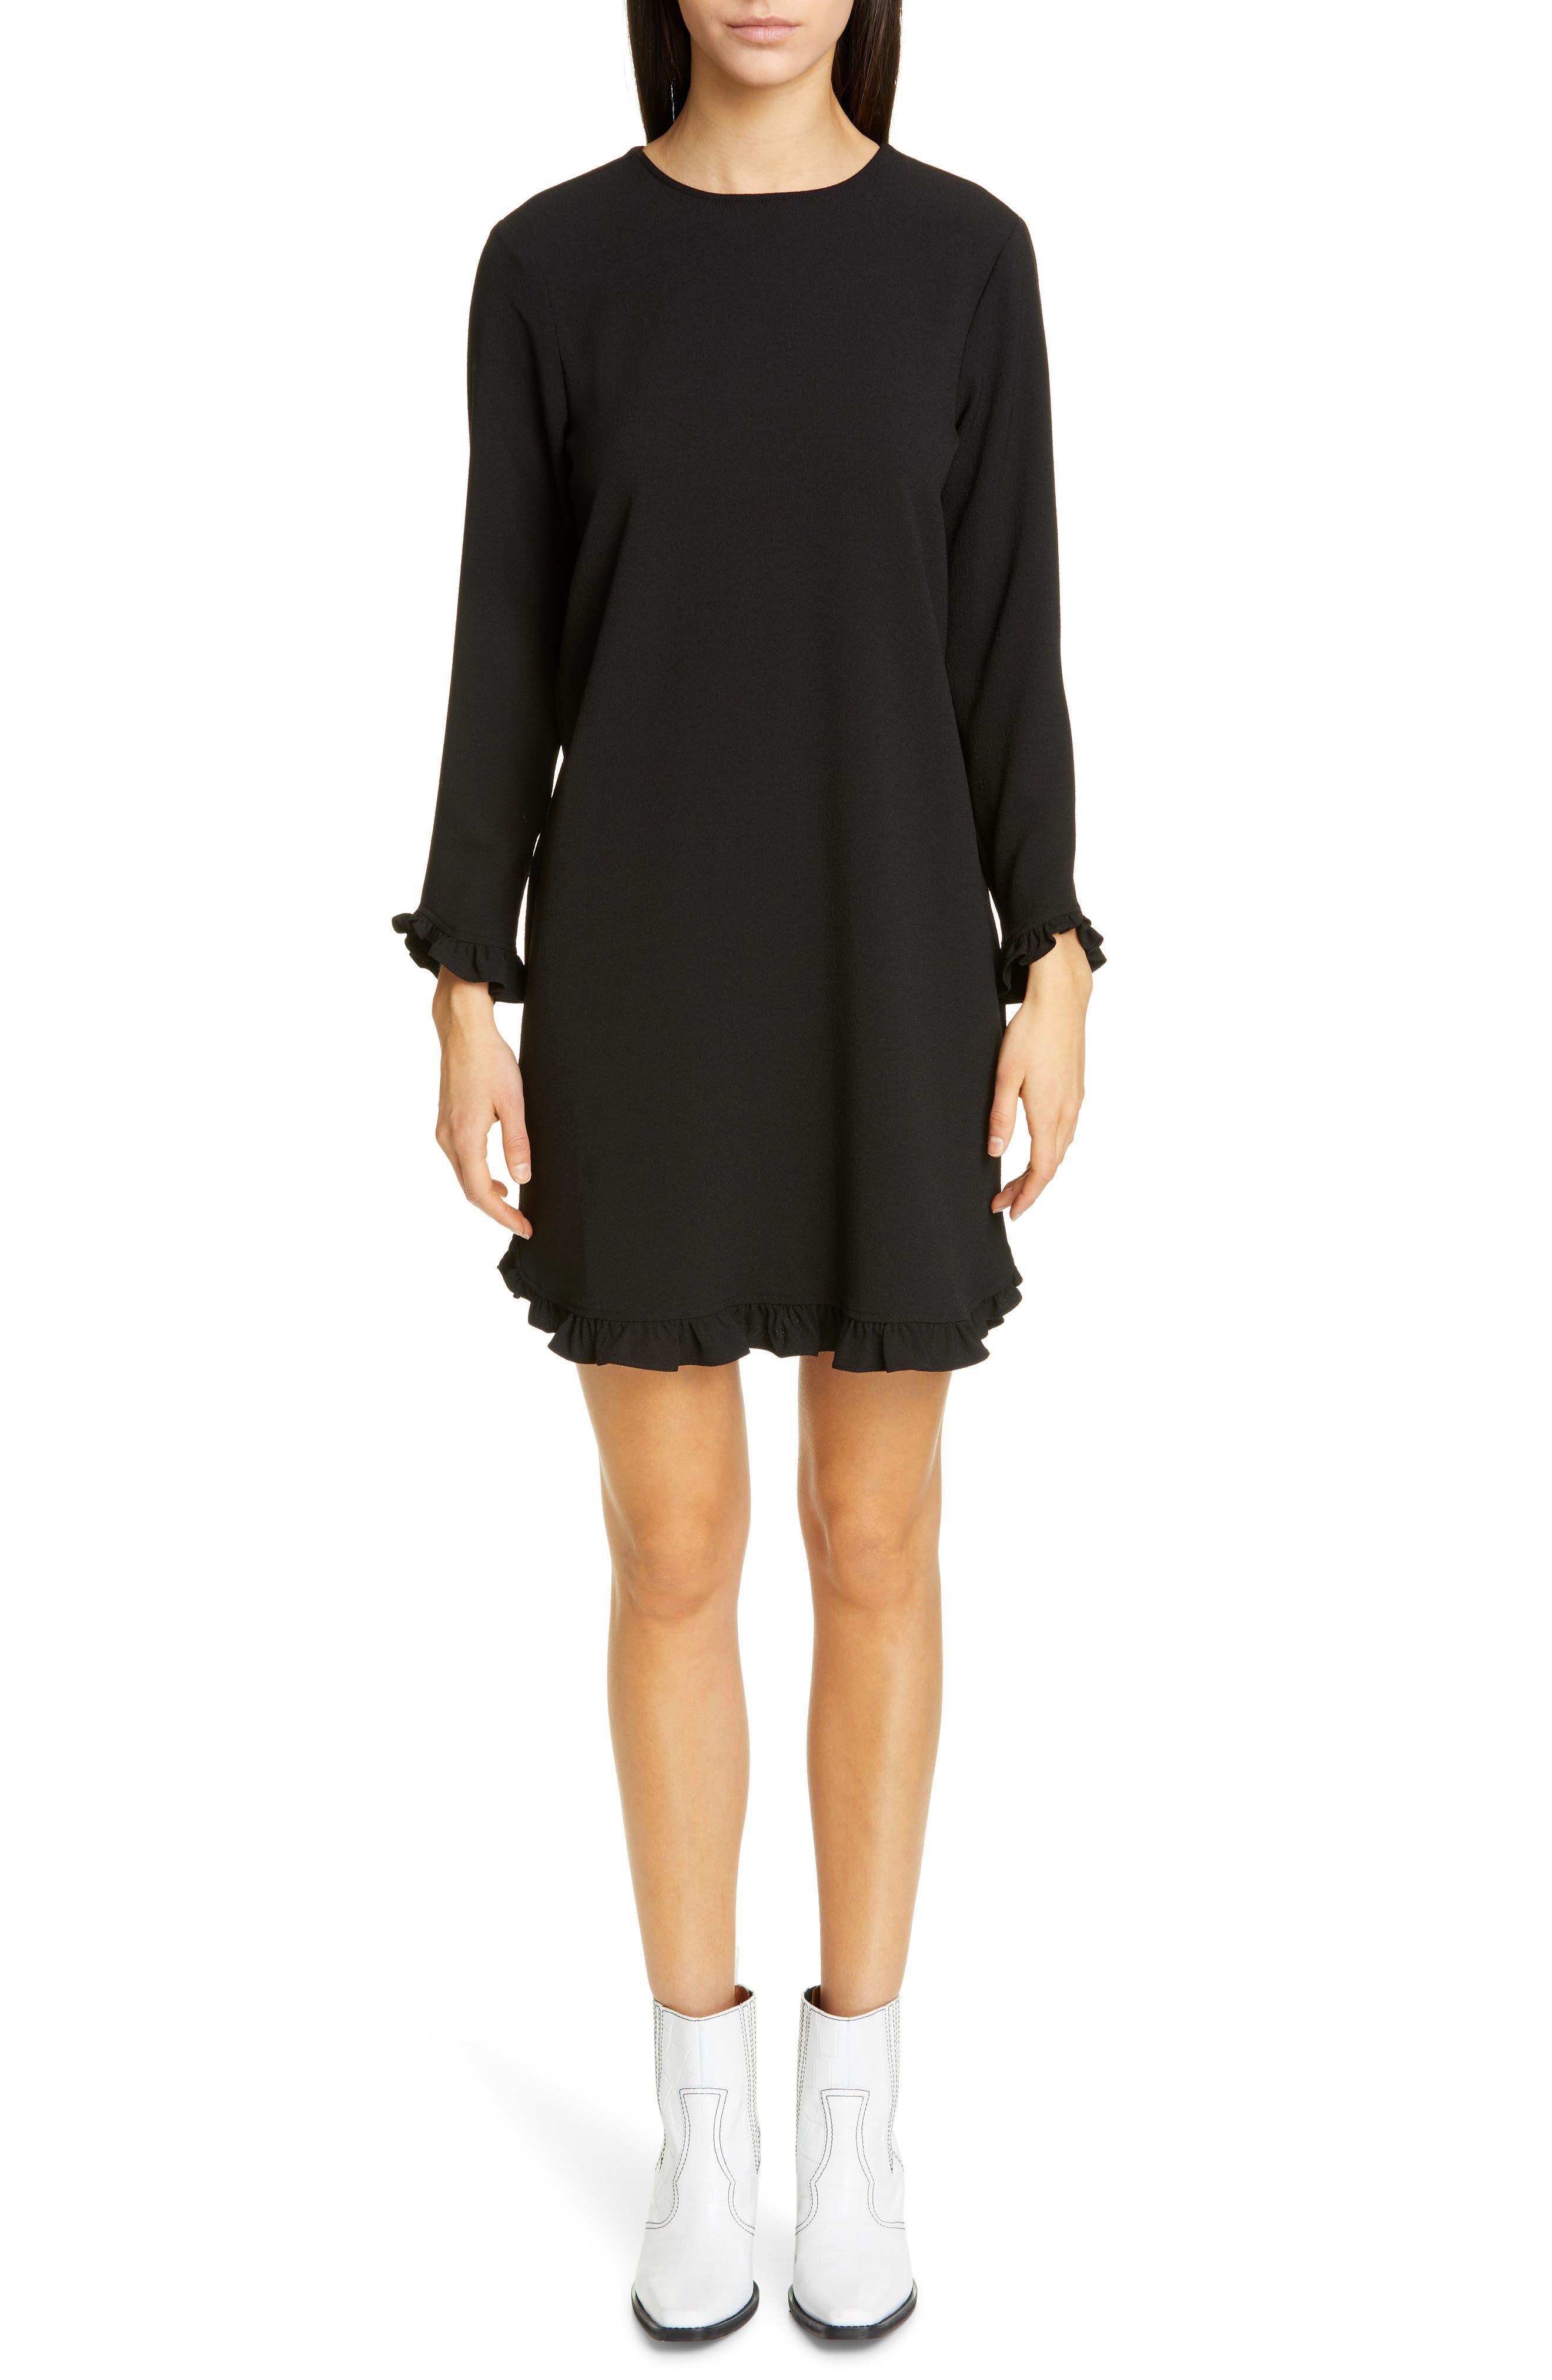 Ganni Clark Dress, US / 4 - Black